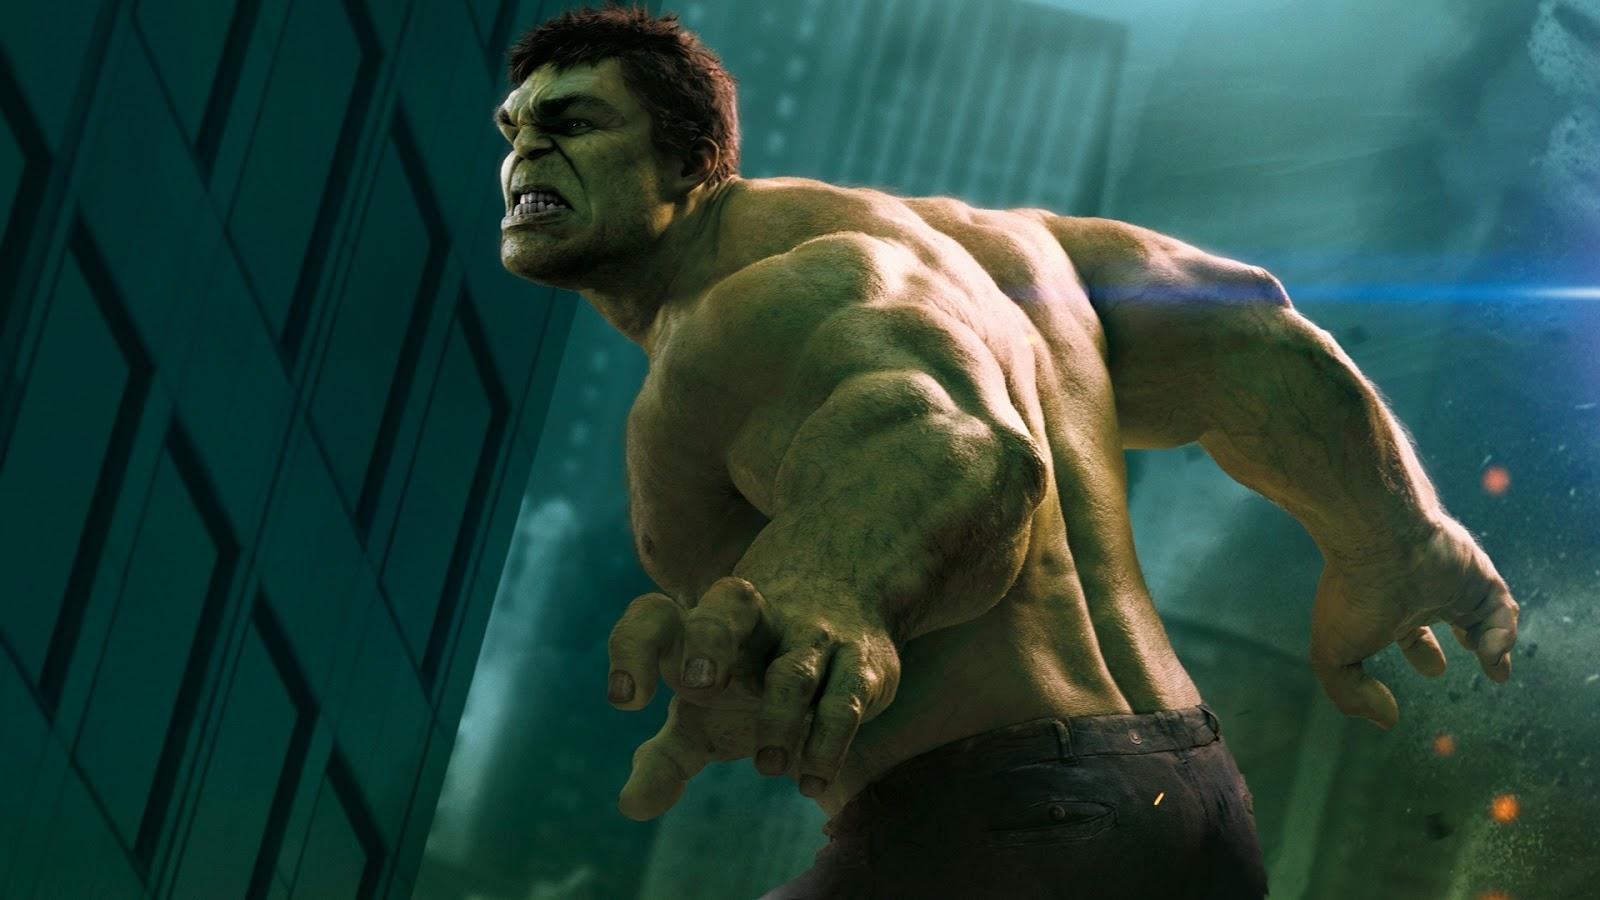 http://4.bp.blogspot.com/-FTj2v4JX0Ng/UBCh2Dw4pRI/AAAAAAAABuU/LT5pVnkTsD4/s1600/Hulk-in-The-Avengers-Desktop-1080p-Wallpapers.jpg